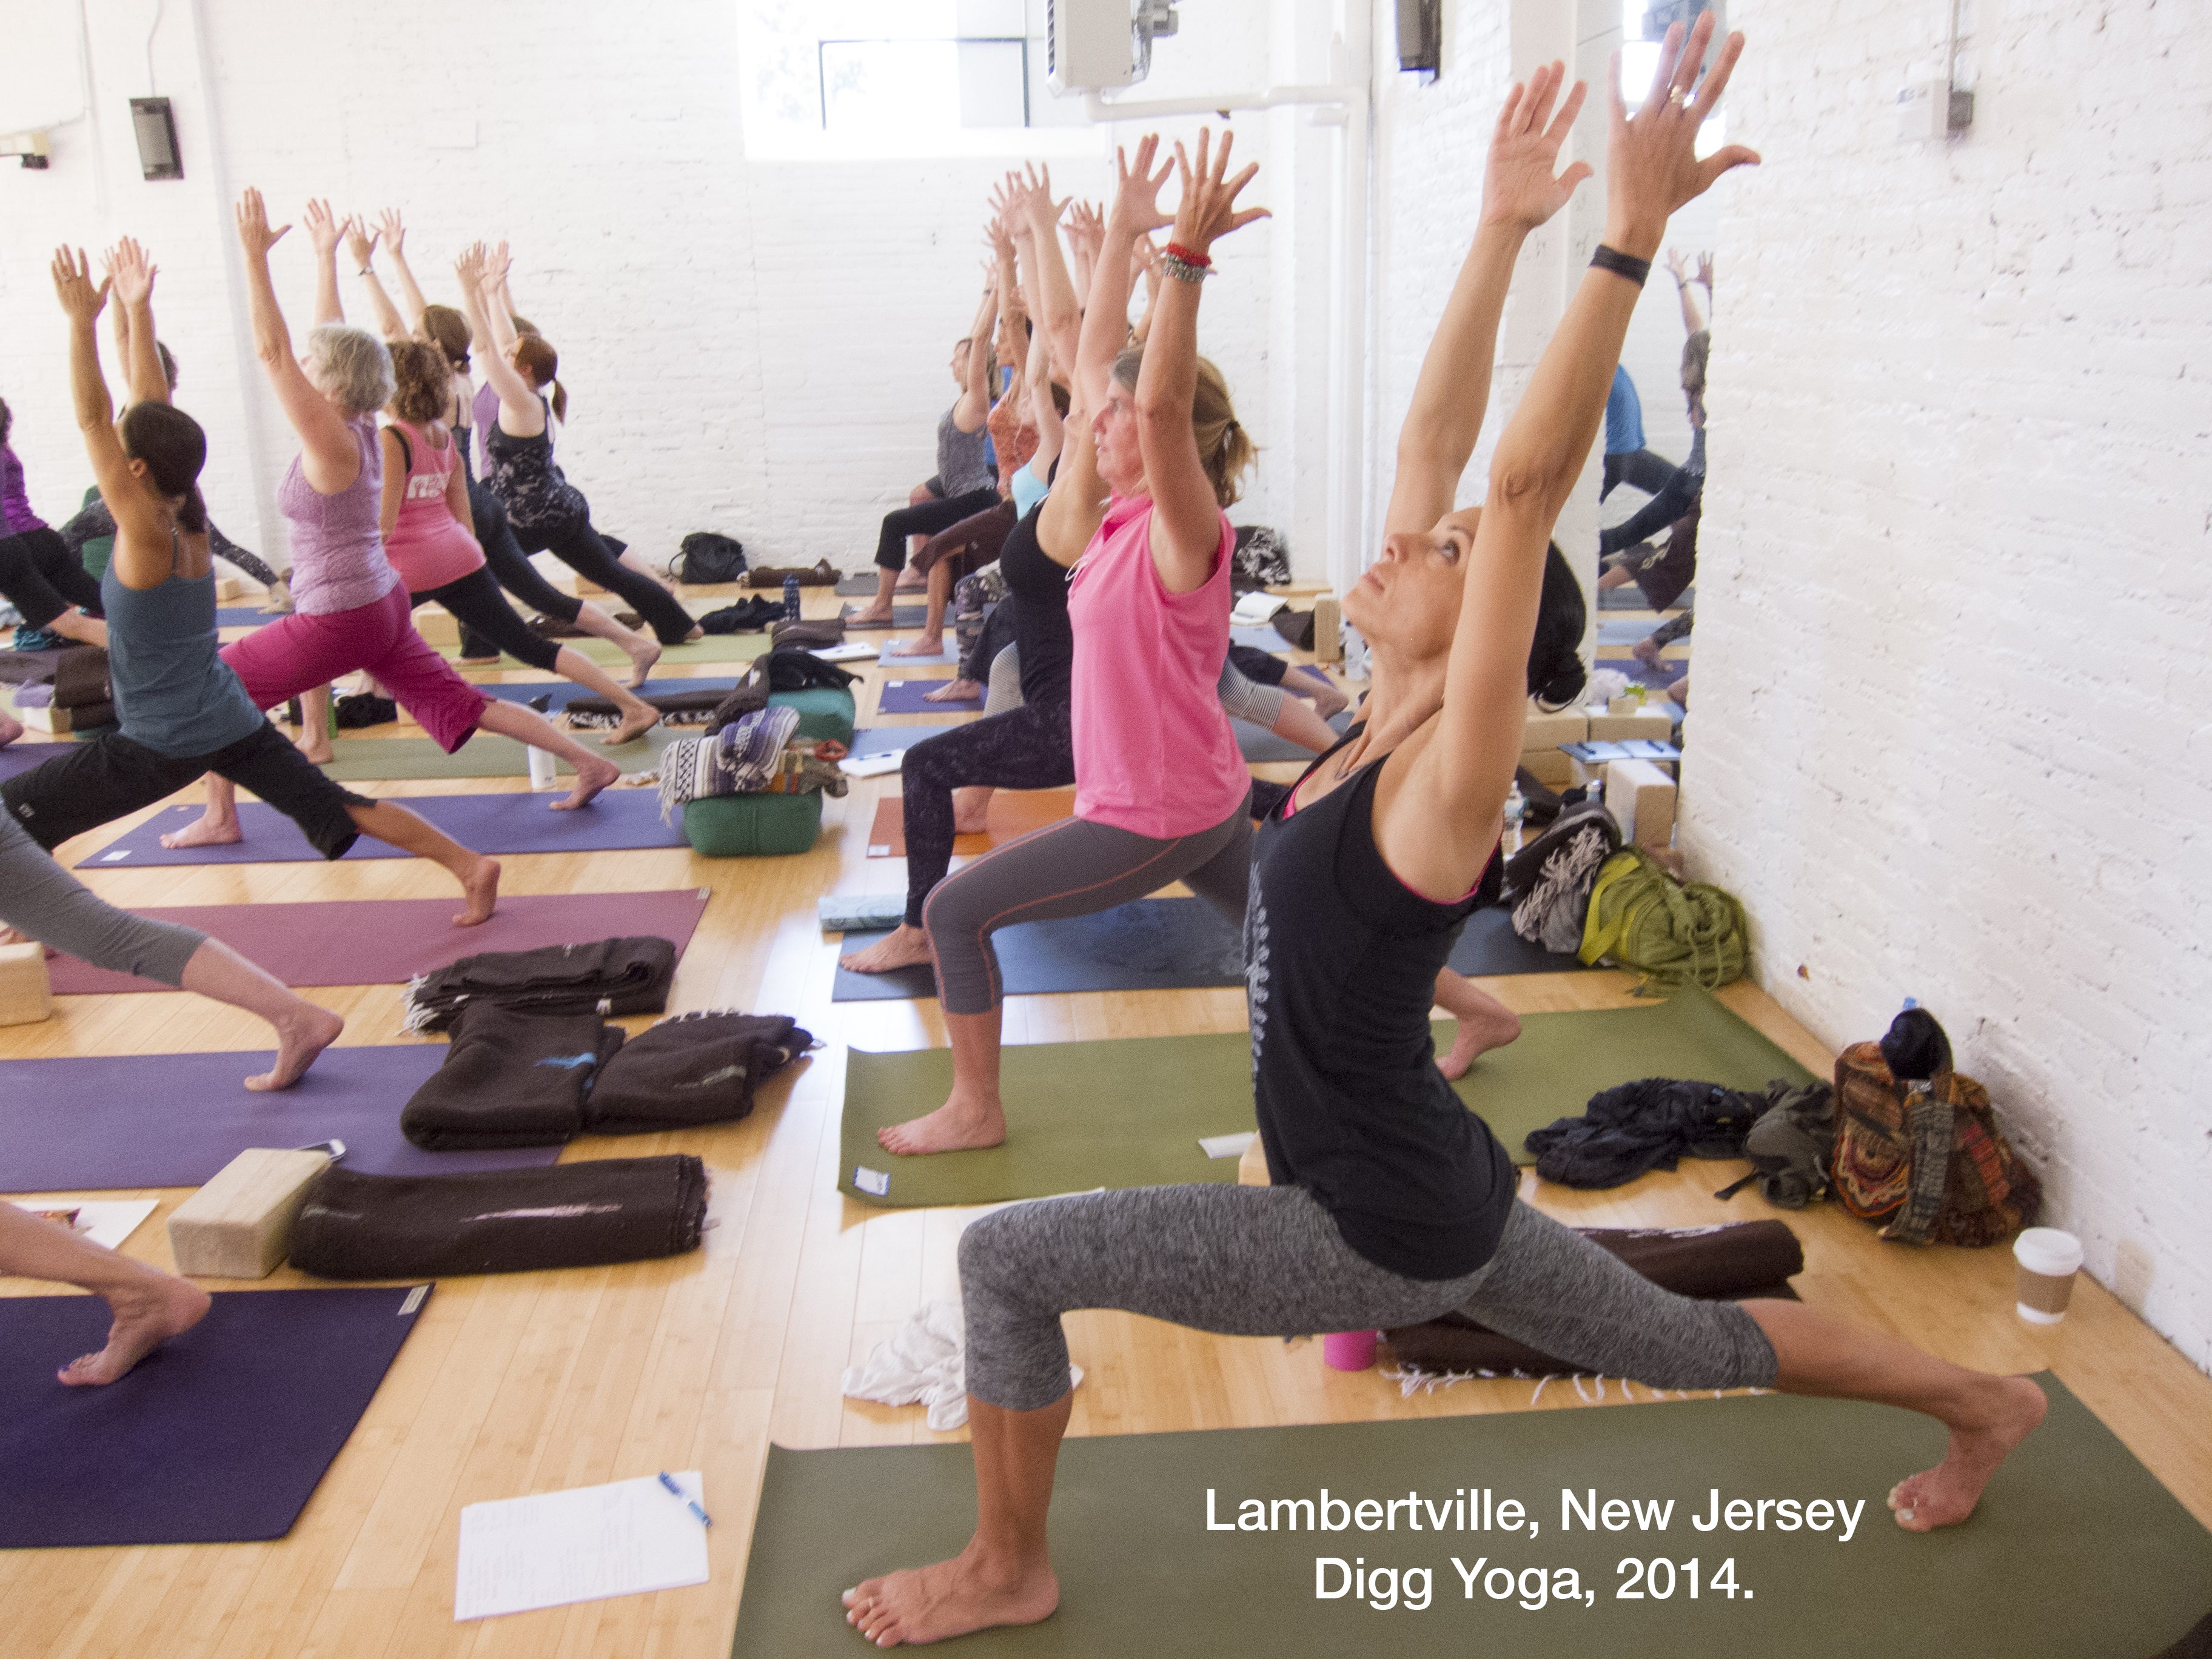 Digg Yoga, Lambertville, New Jersey